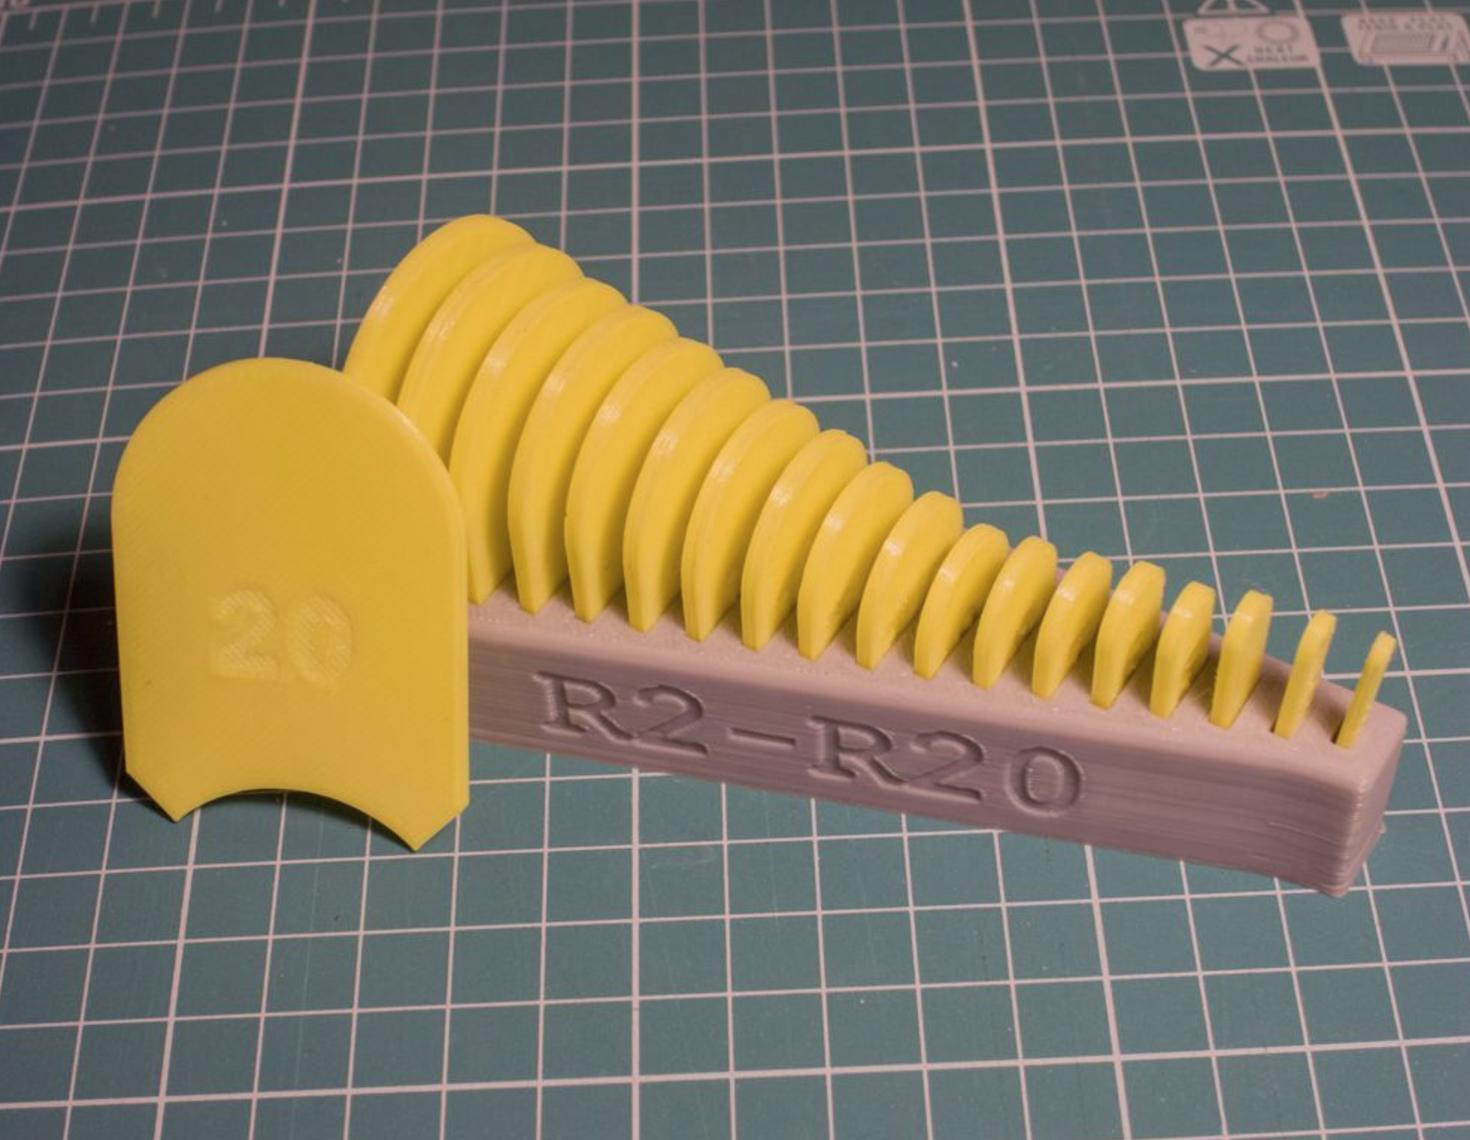 Capture d'écran 2017-09-14 à 10.52.28.png Download free STL file Radius measuring toolset • Design to 3D print, kpawel